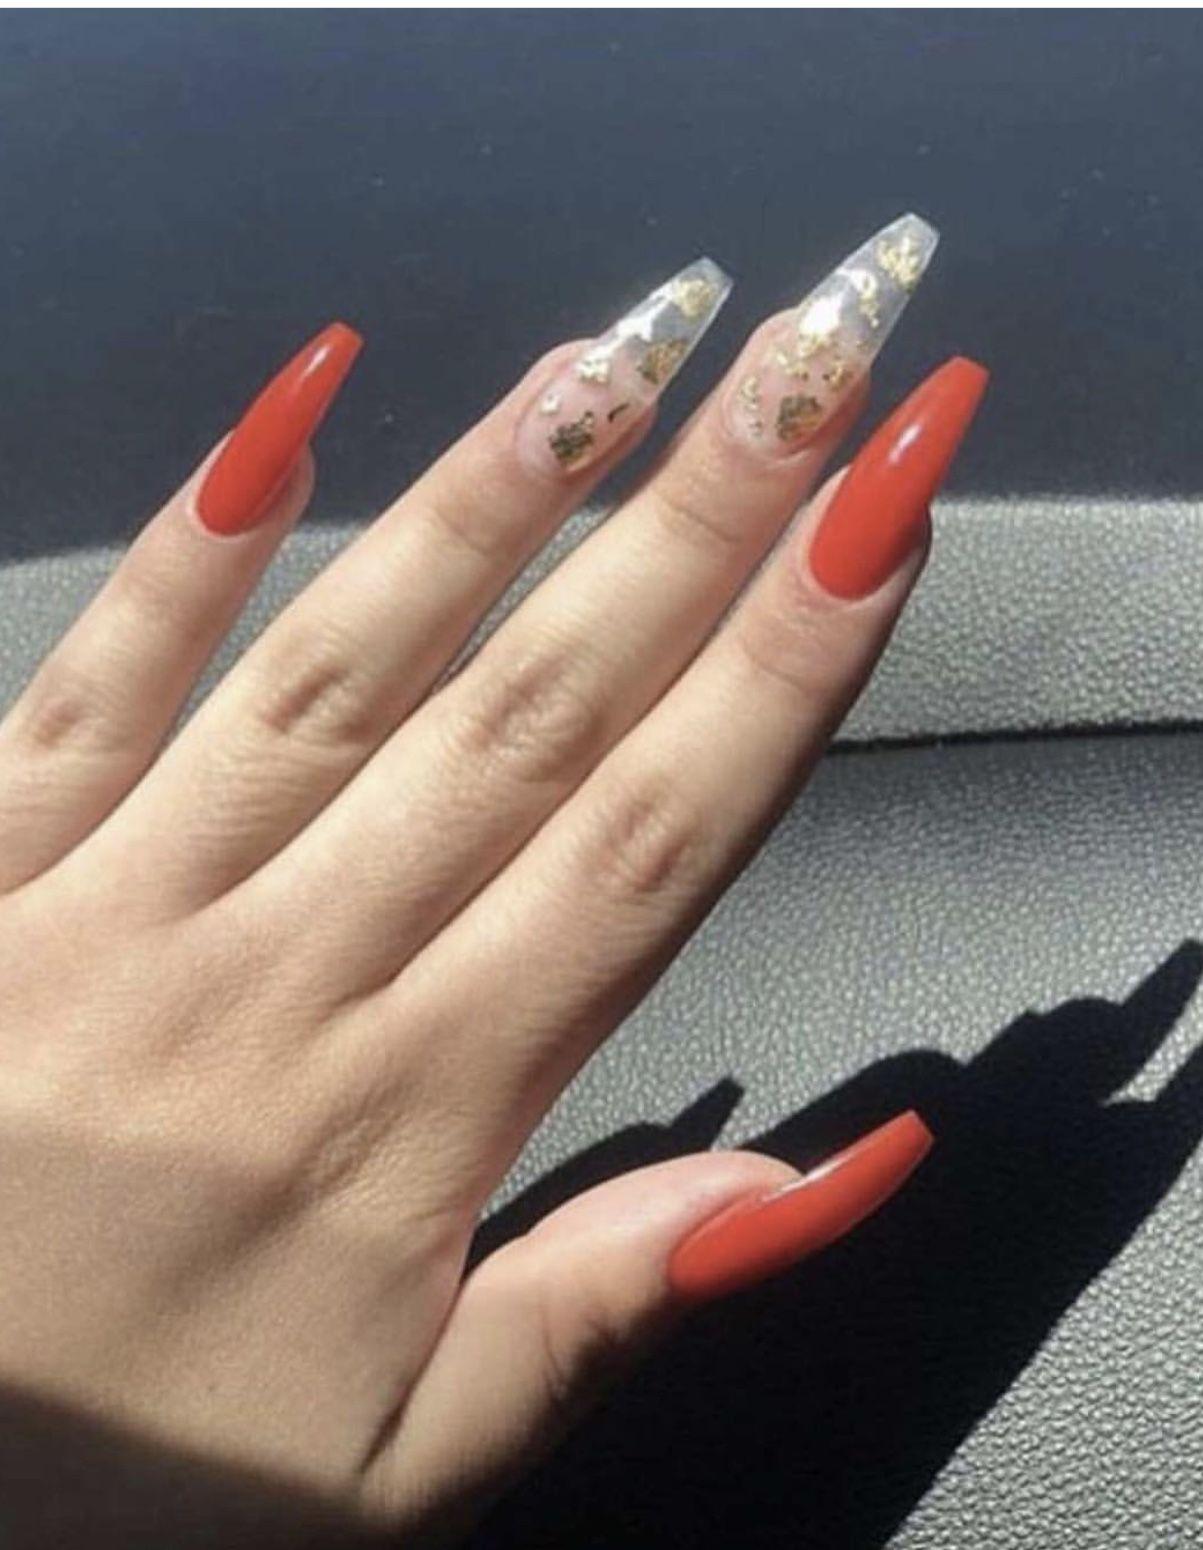 Pin by 𝖅𝖎𝖆𝖓𝖓𝖆🥰 on •|nail inspo | Halloween acrylic nails ...